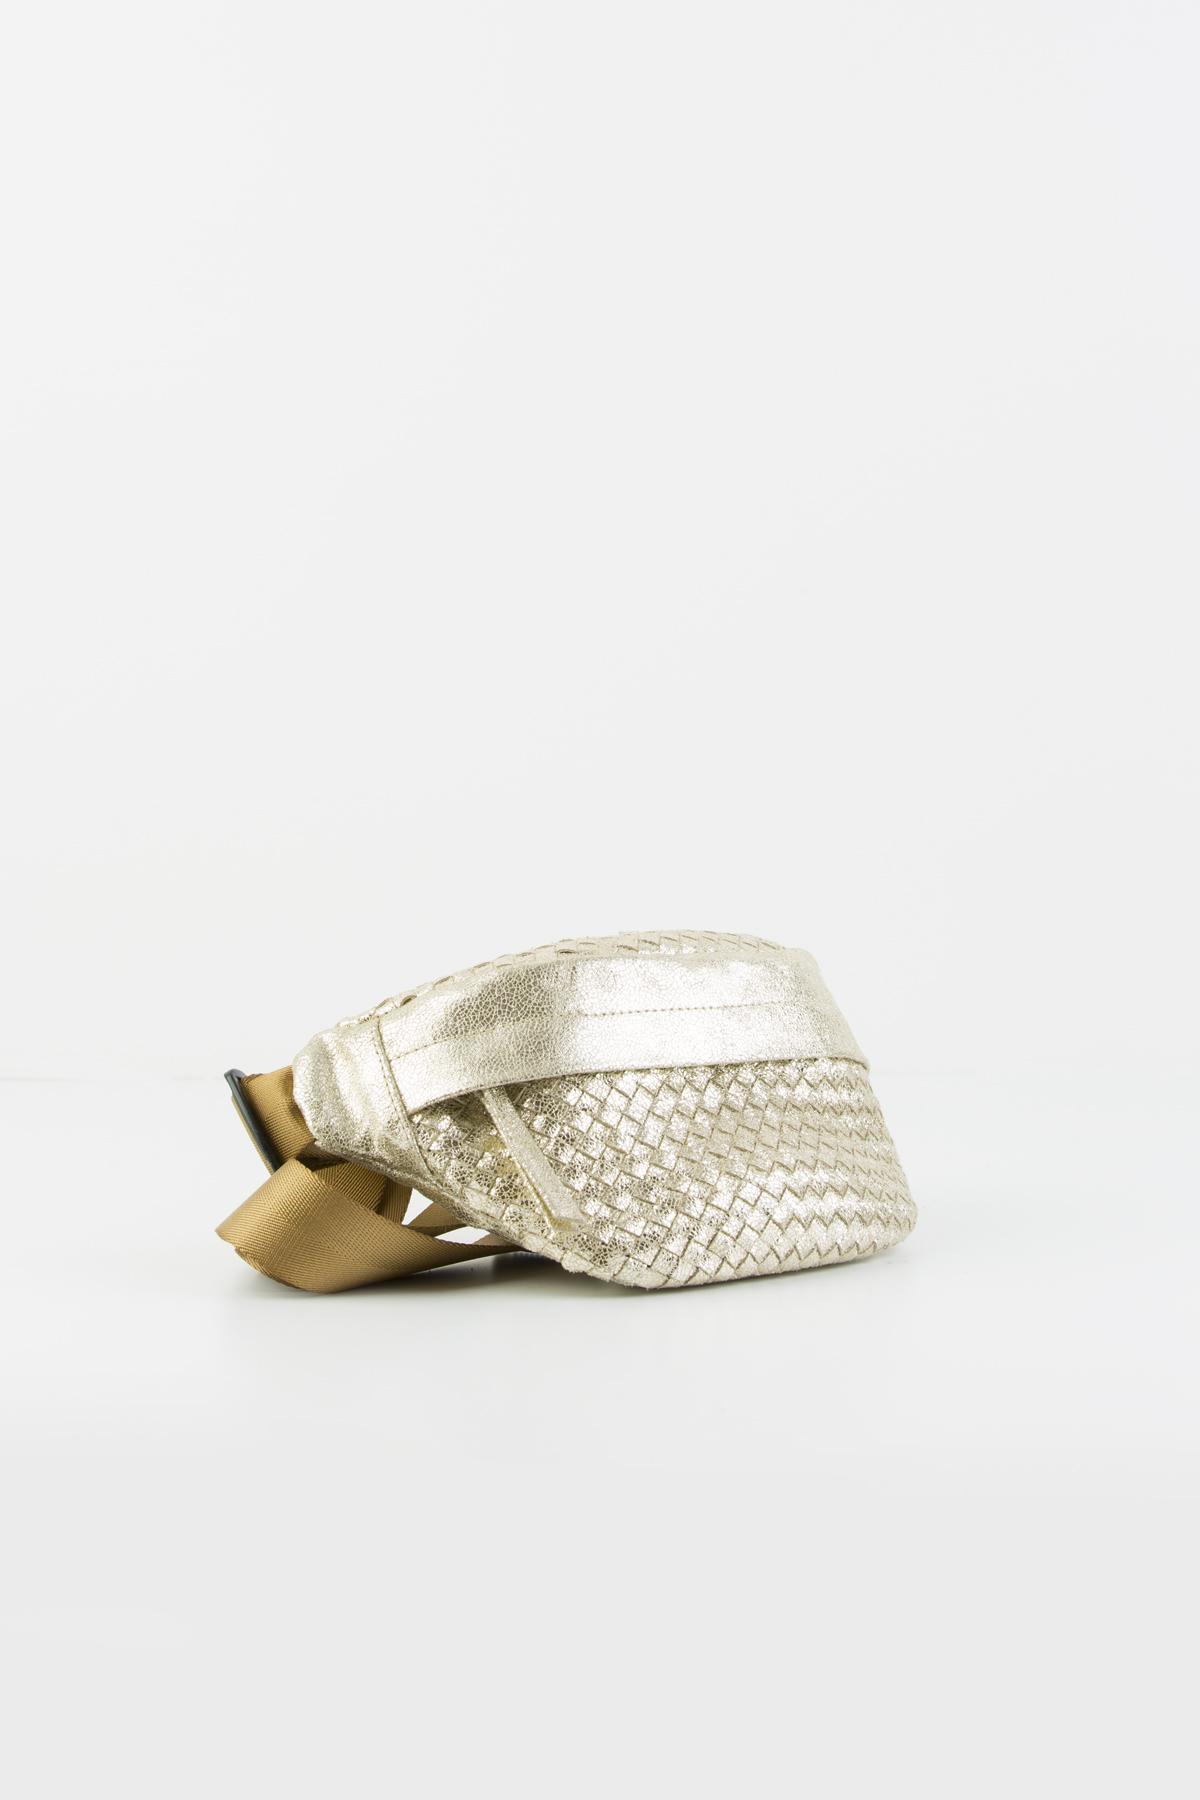 bum-bag-belt-leather-handmade-golden-silver-claramonte-matchboxathens